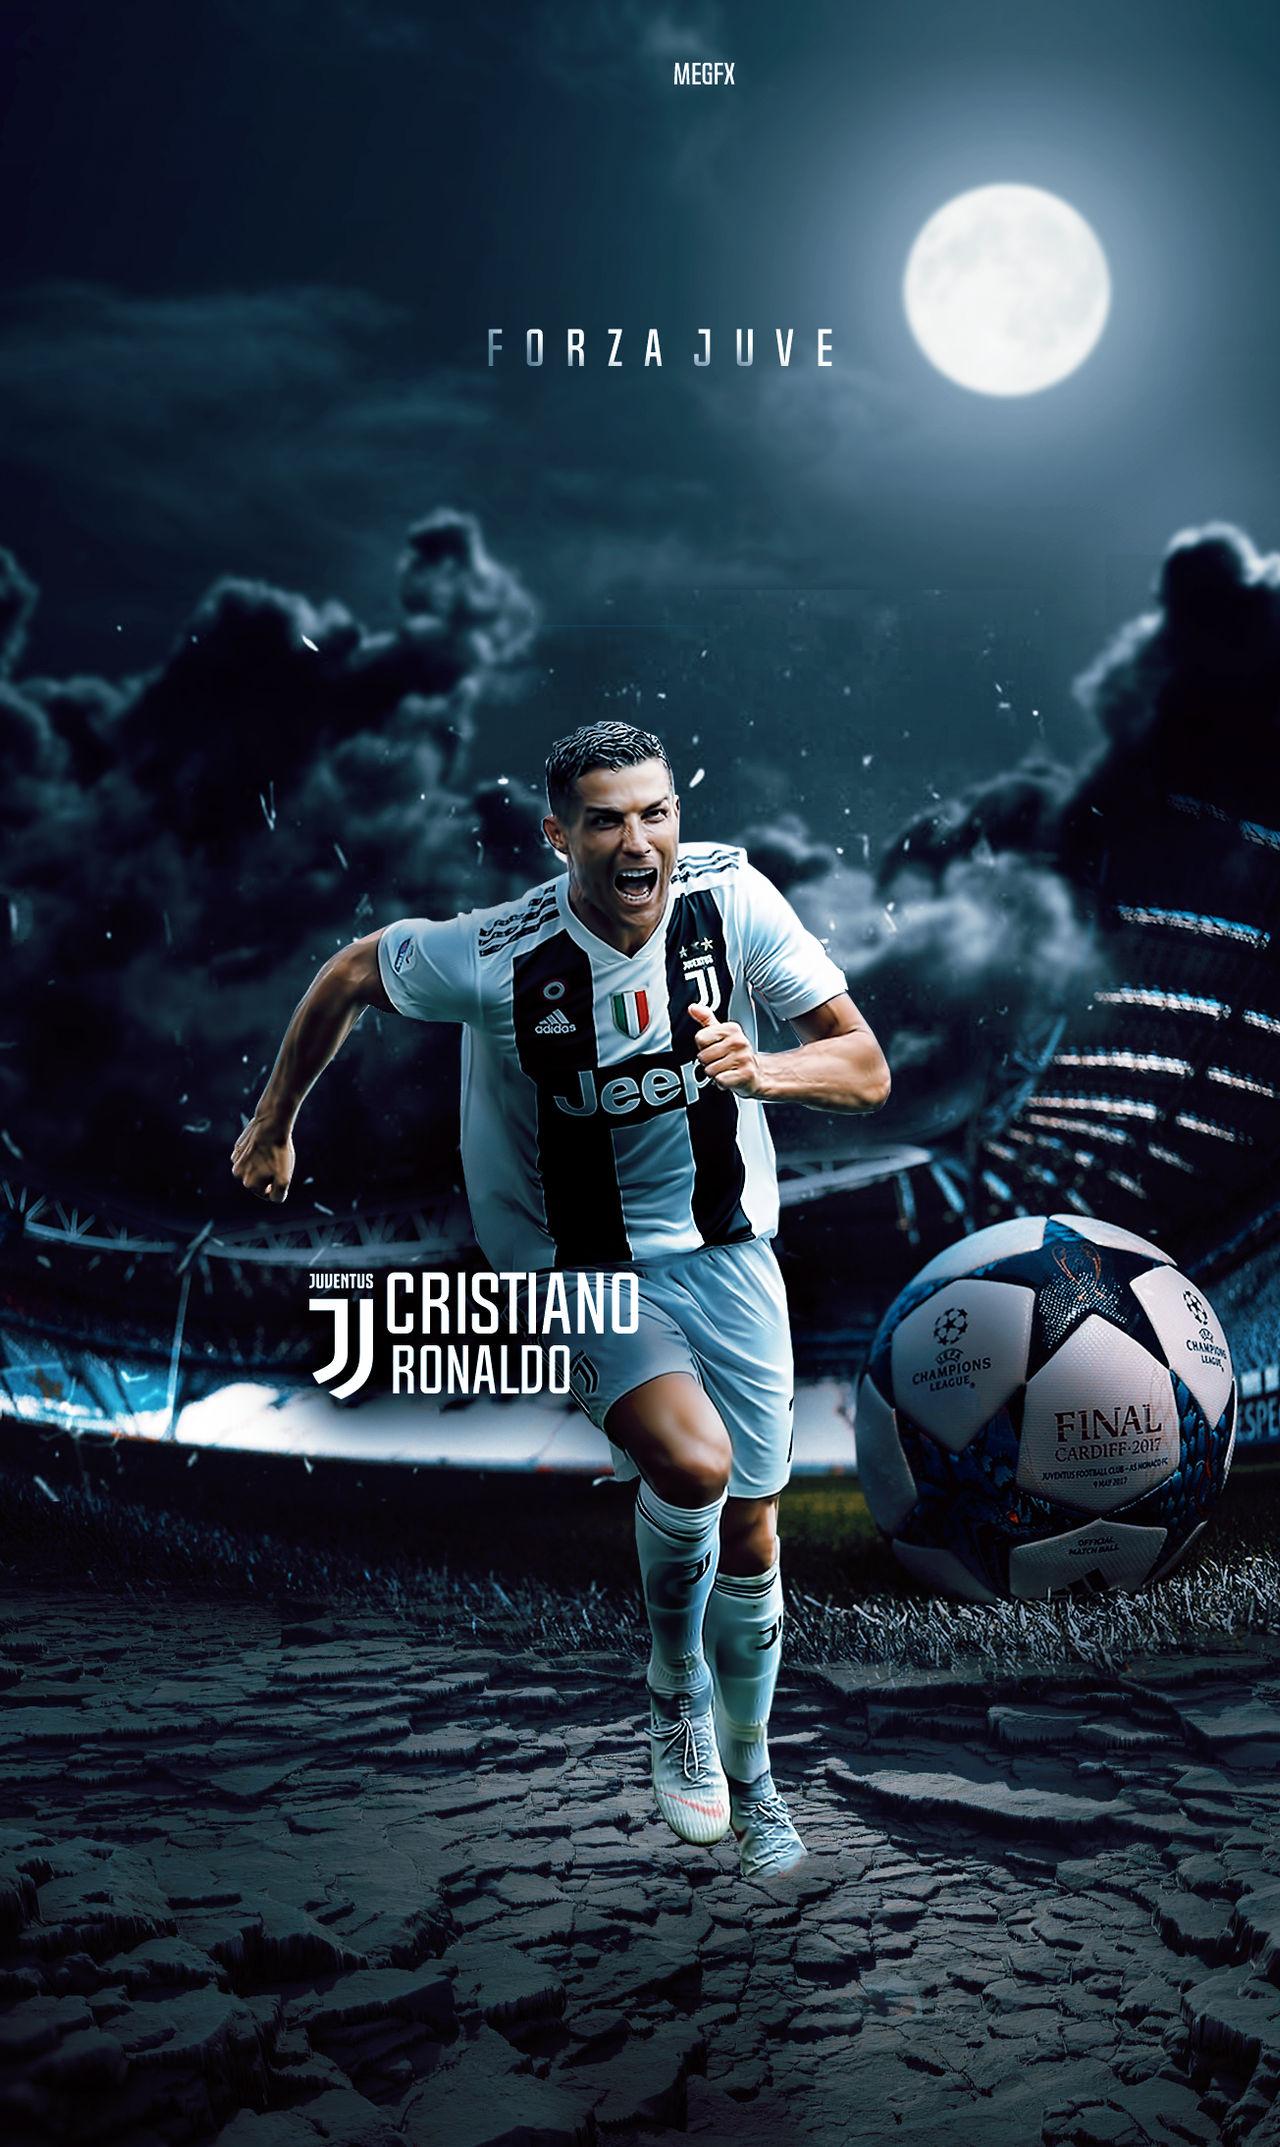 Cristiano Ronaldo Wallpaper Lockscreen By Mohamedgfx10 On